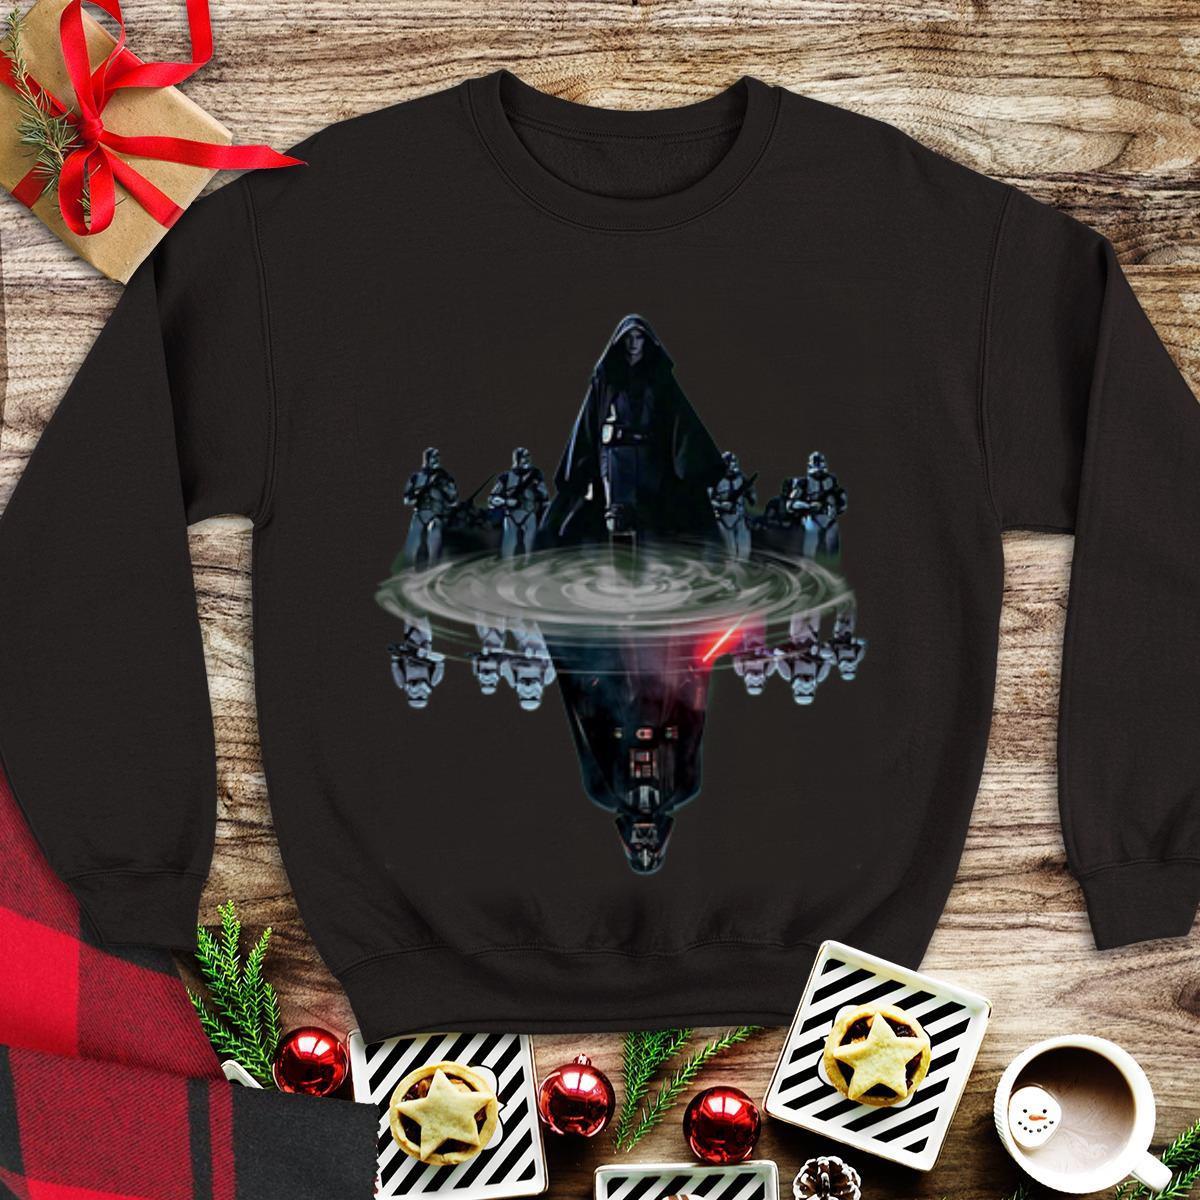 Awesome Star Wars Dark Vader Reflection Mirror Water Shirt 1 1.jpg